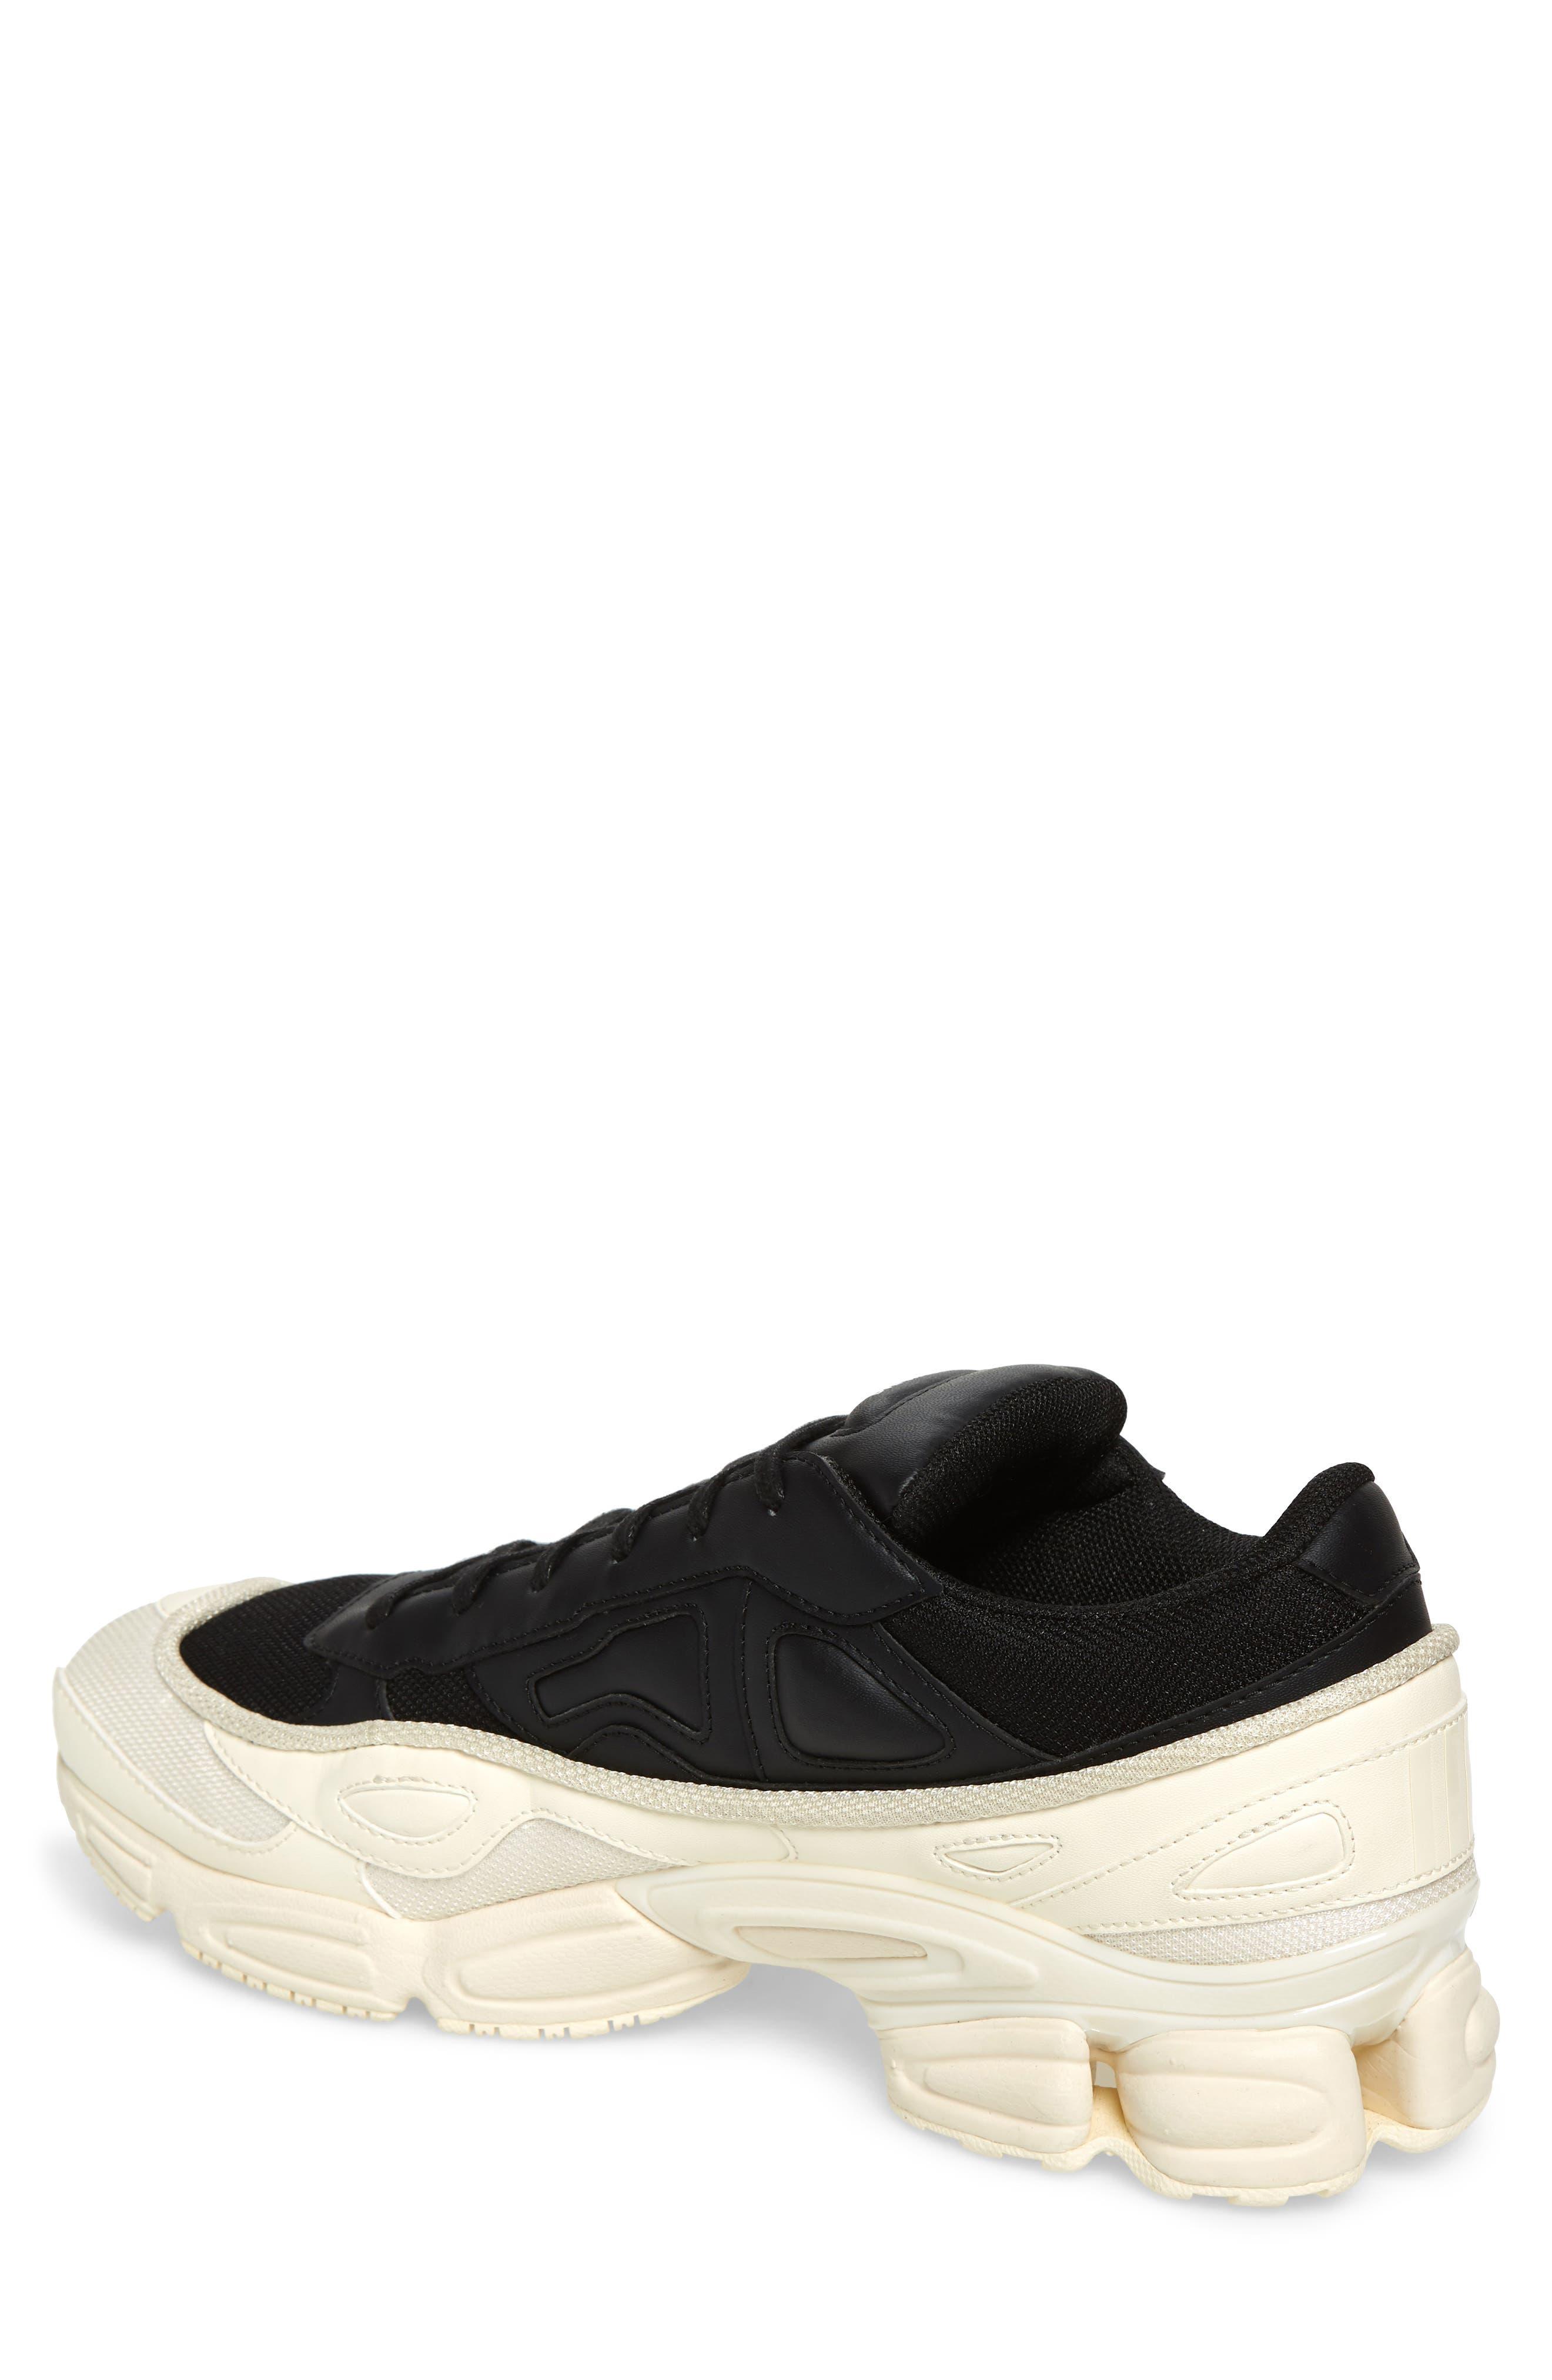 adidas by Raf Simons Ozweego III Sneaker,                             Alternate thumbnail 2, color,                             CREAM WHITE/ CORE BLACK